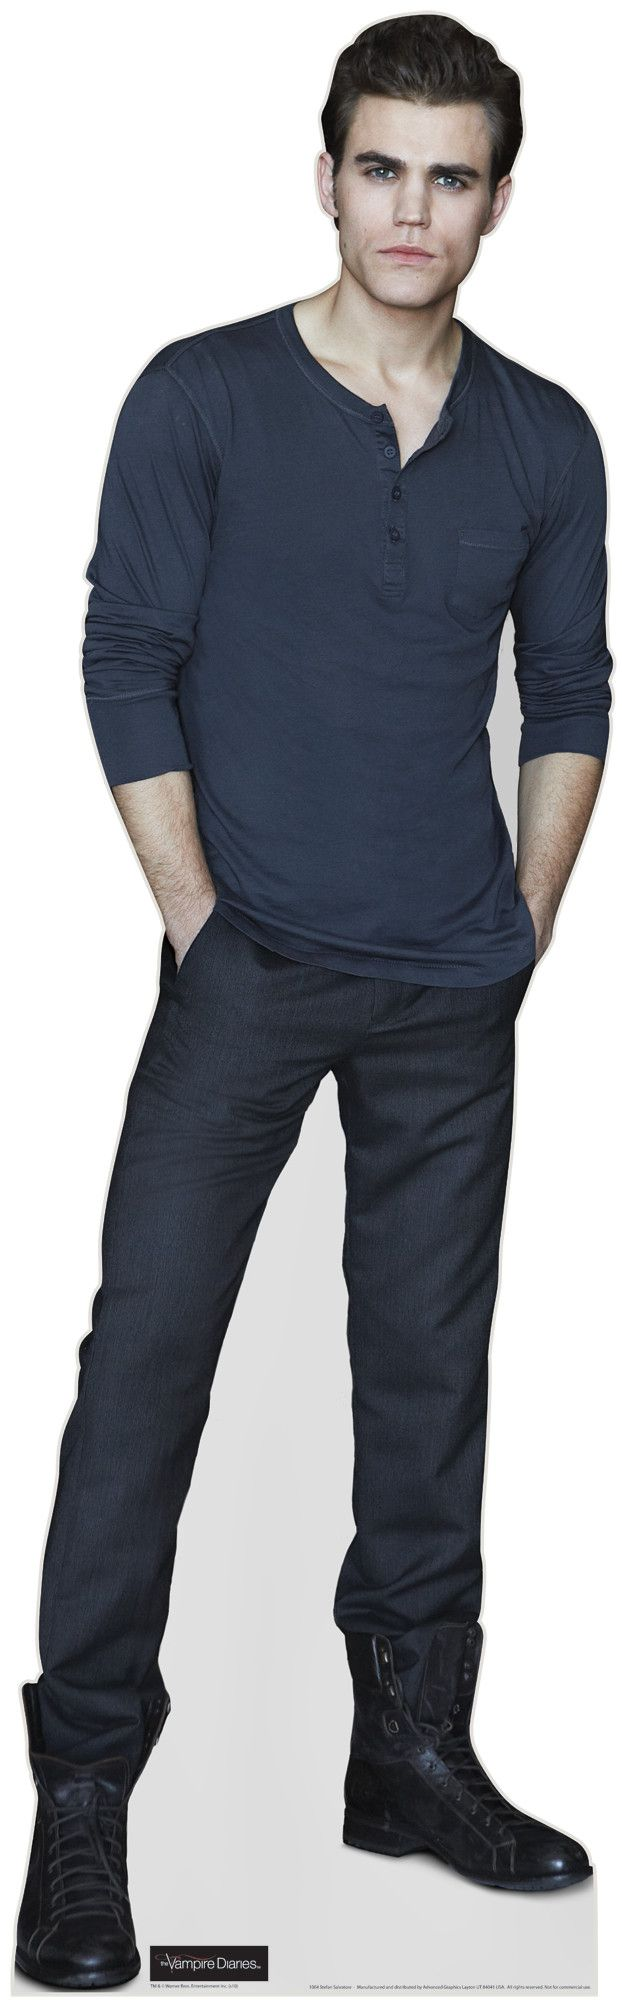 Stefan Salvatore from Vampire Diaries Cardboard Standup